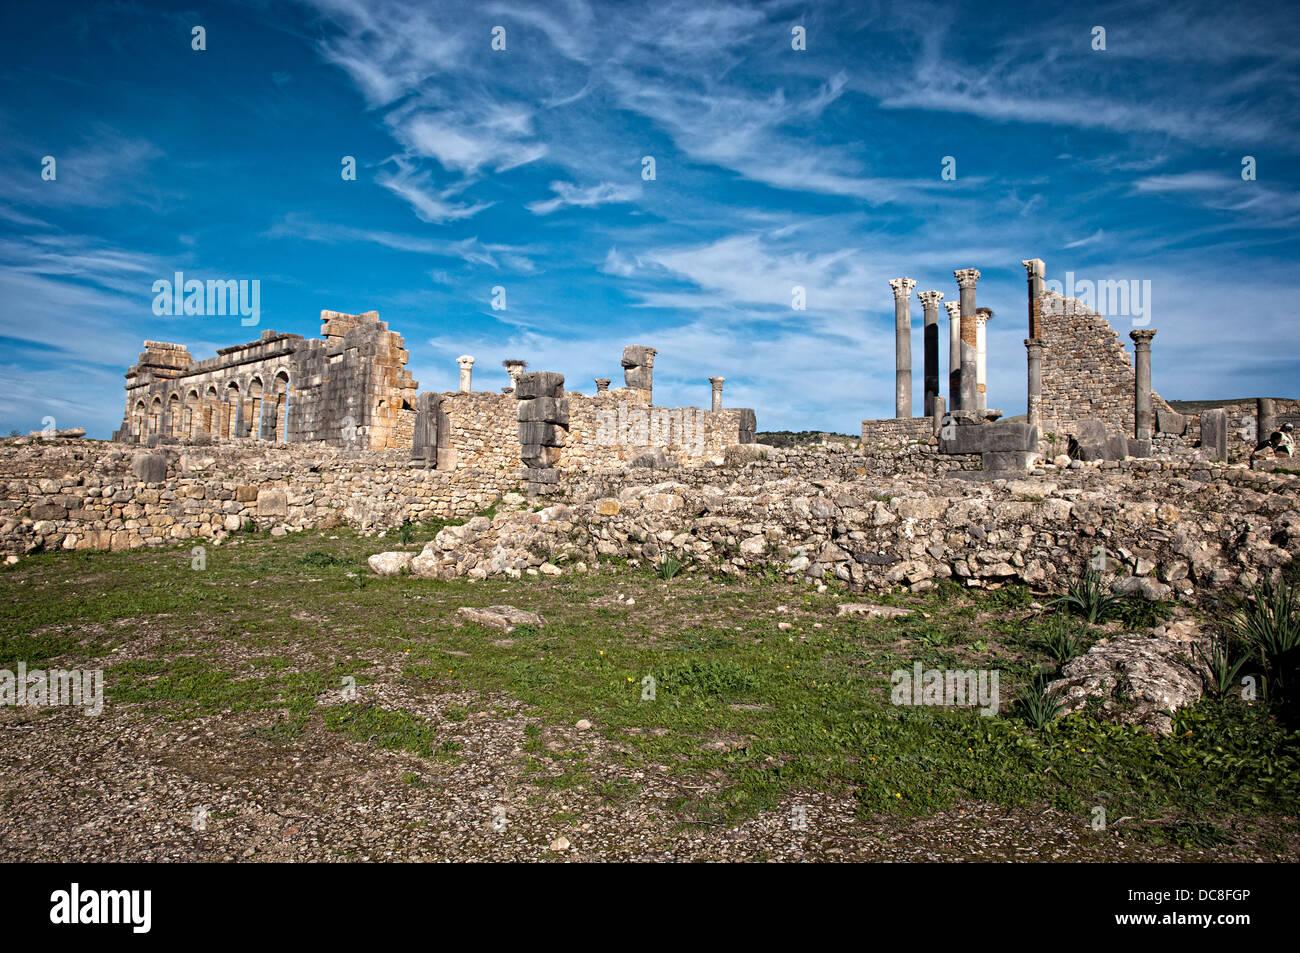 Archeological Site, Roman Ruins, Volubilis. Morocco - Stock Image